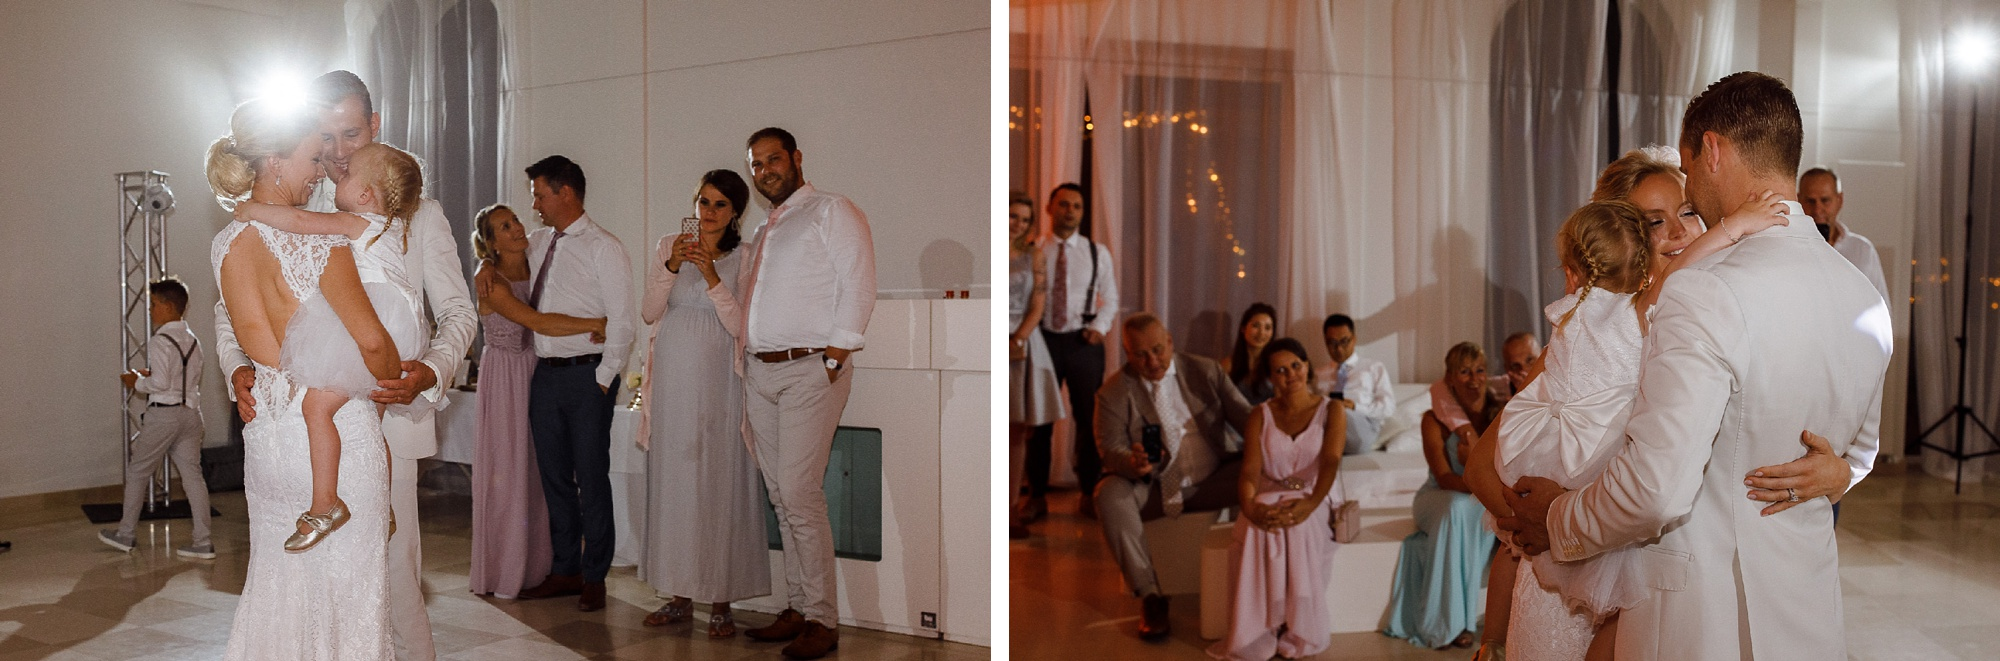 Wedding-Chateau-de-Varennes-082.jpg